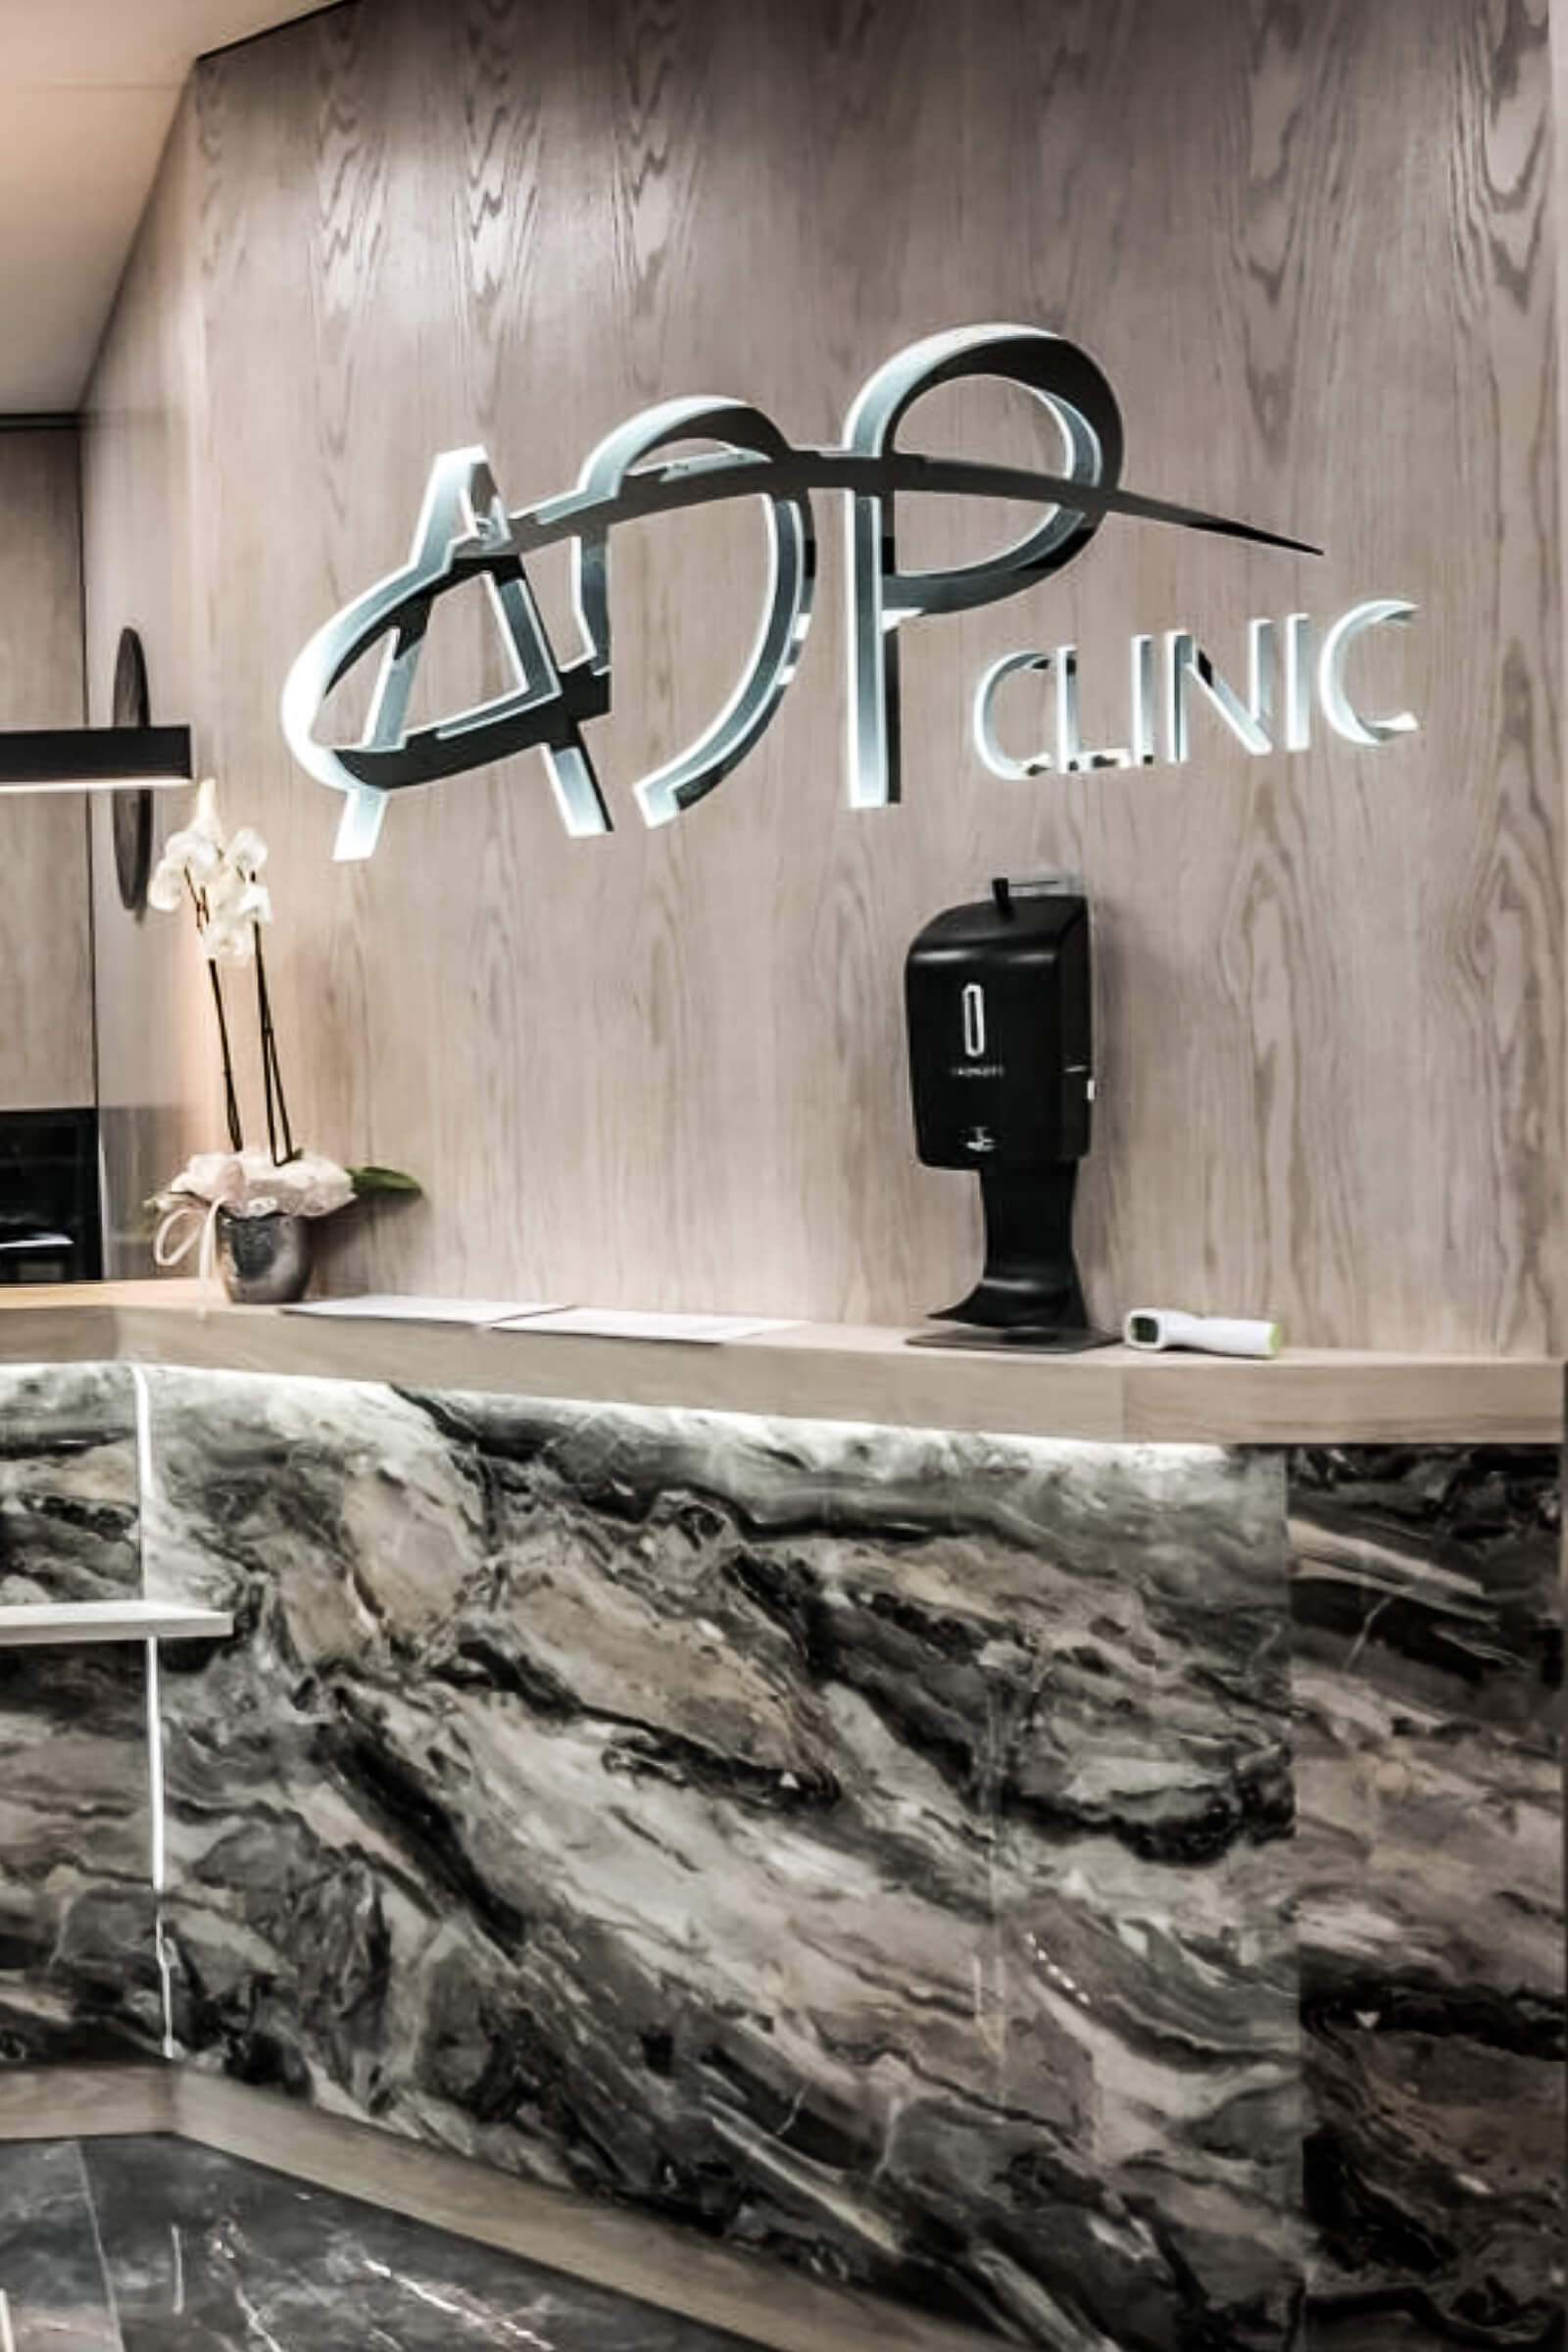 ADP Clinic Lublin Centrum Implantologii i Stomatologii